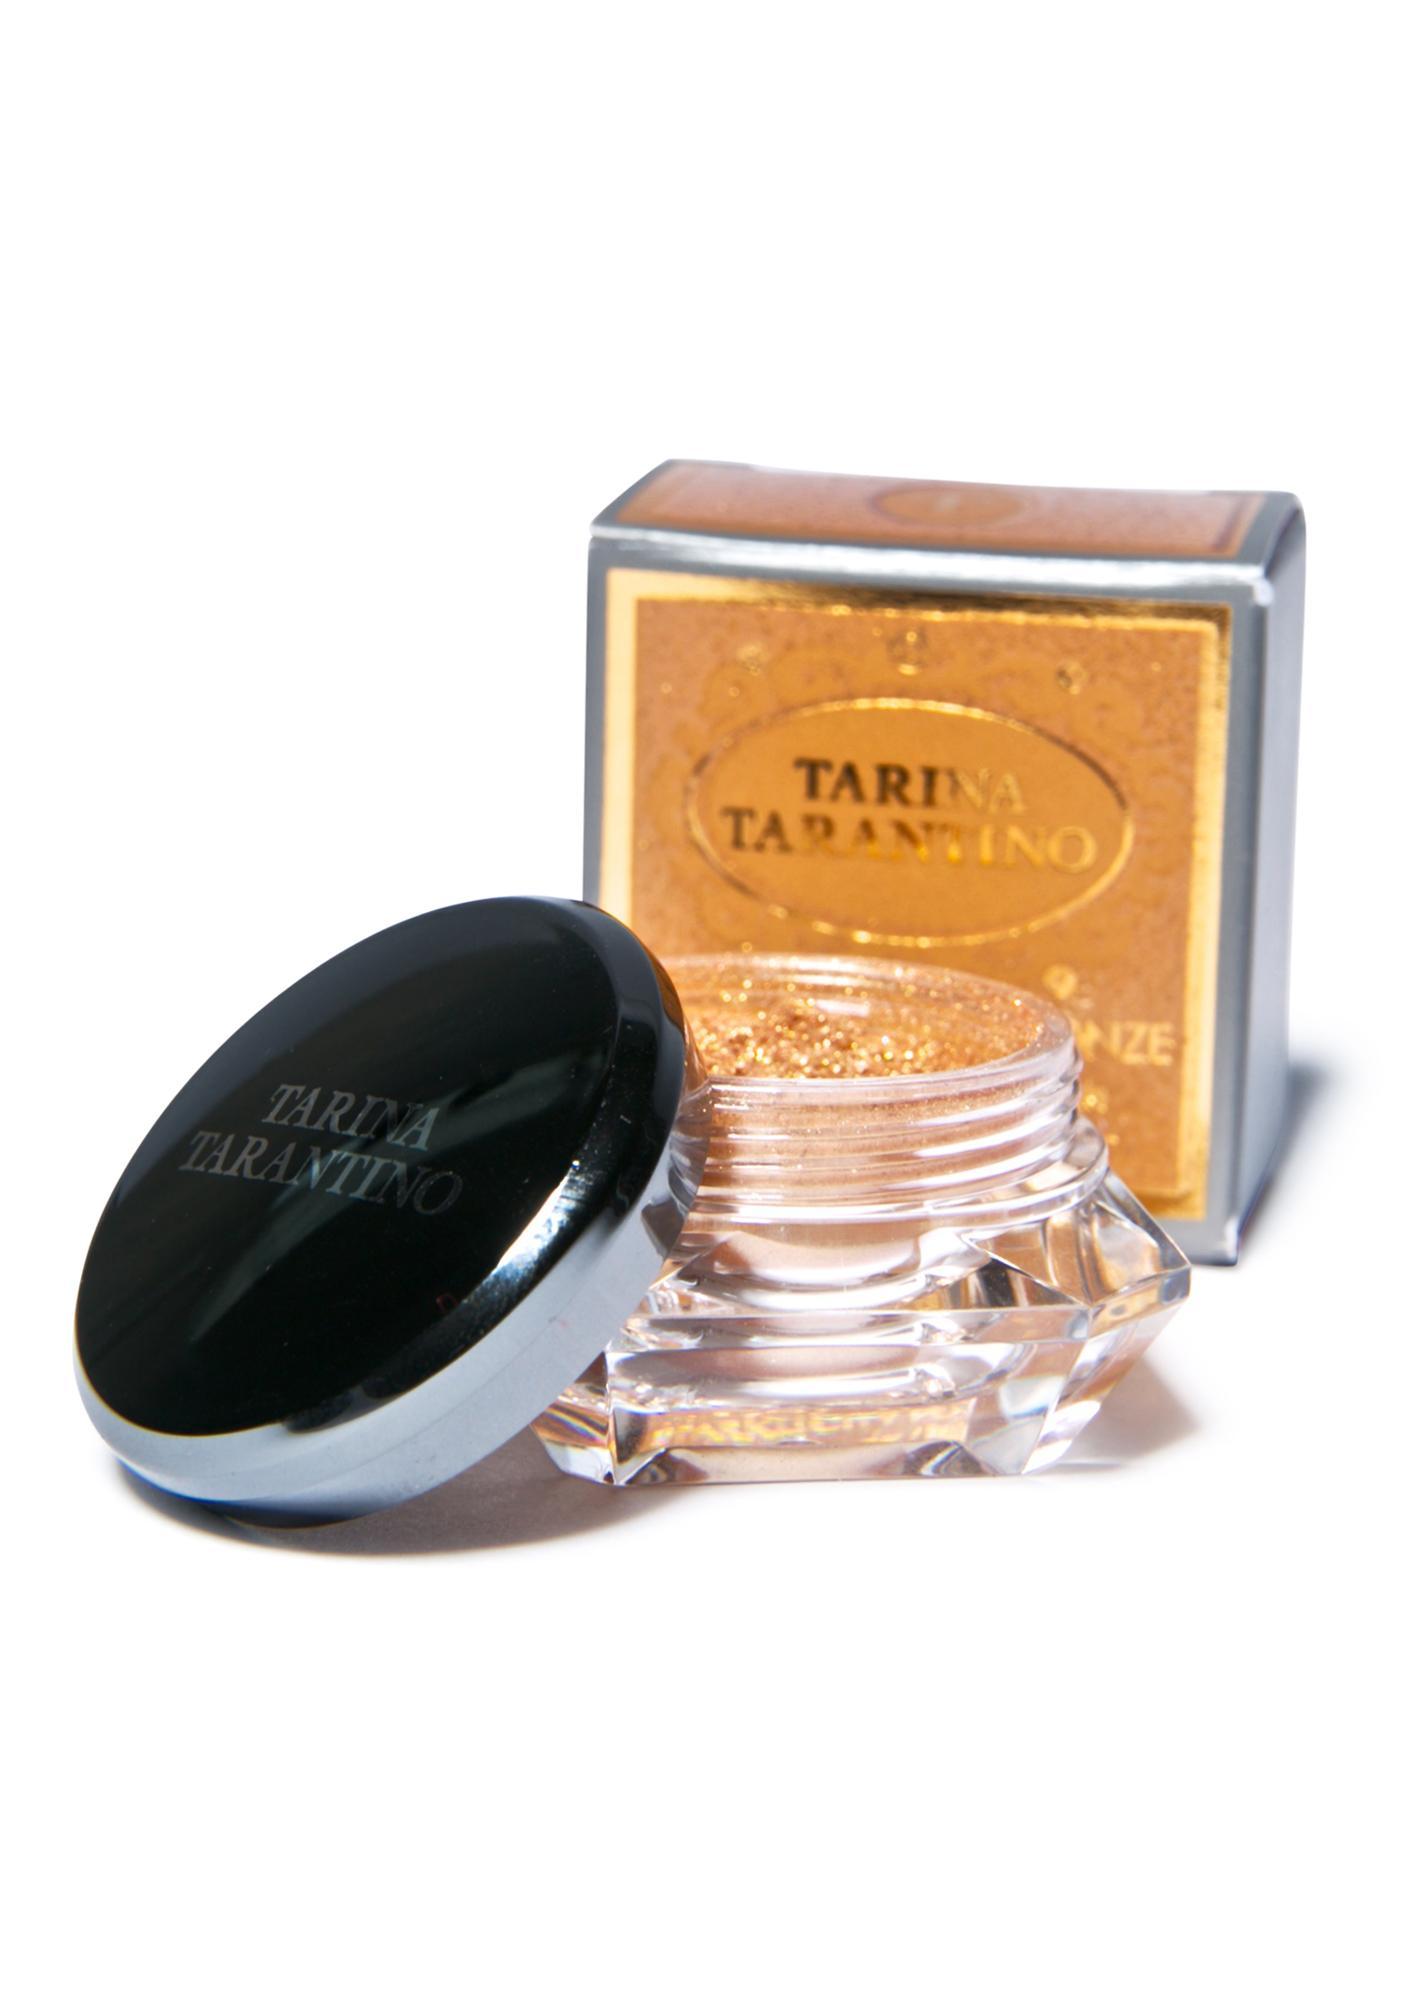 Tarina Tarantino Bronze Sparklicity Pure Loose Shimmer Dust